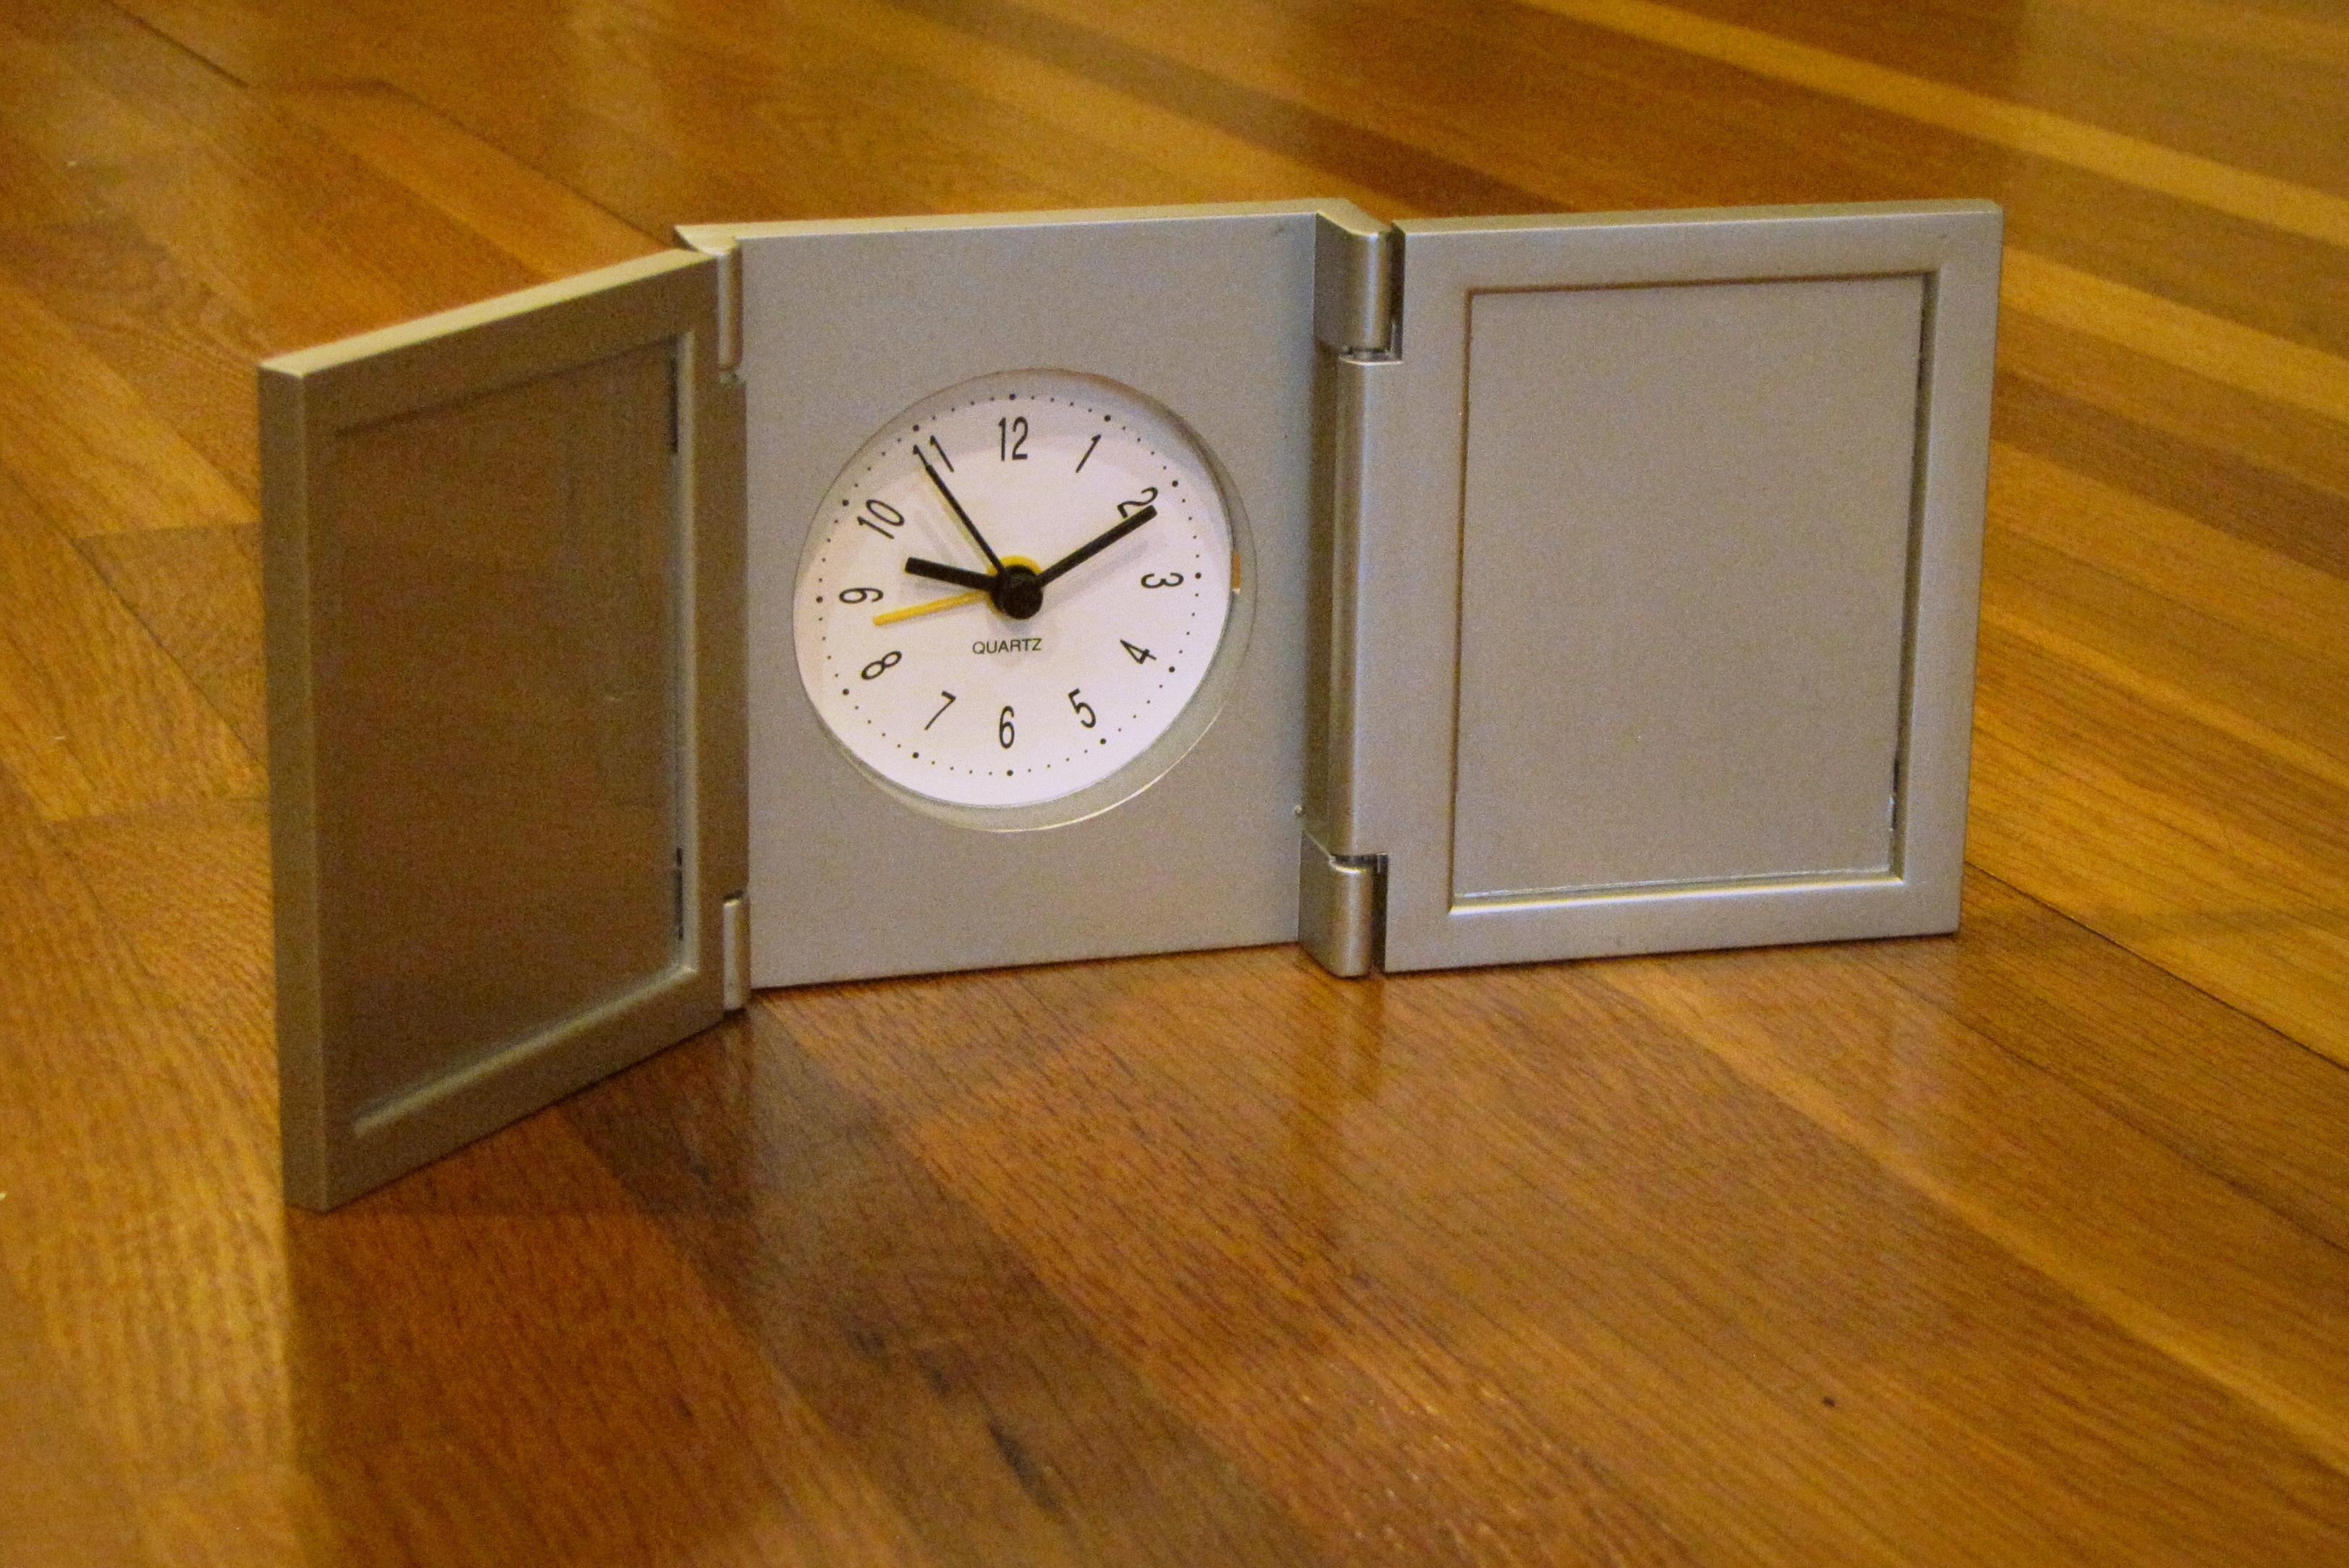 Picture of Refurbishing the Clock